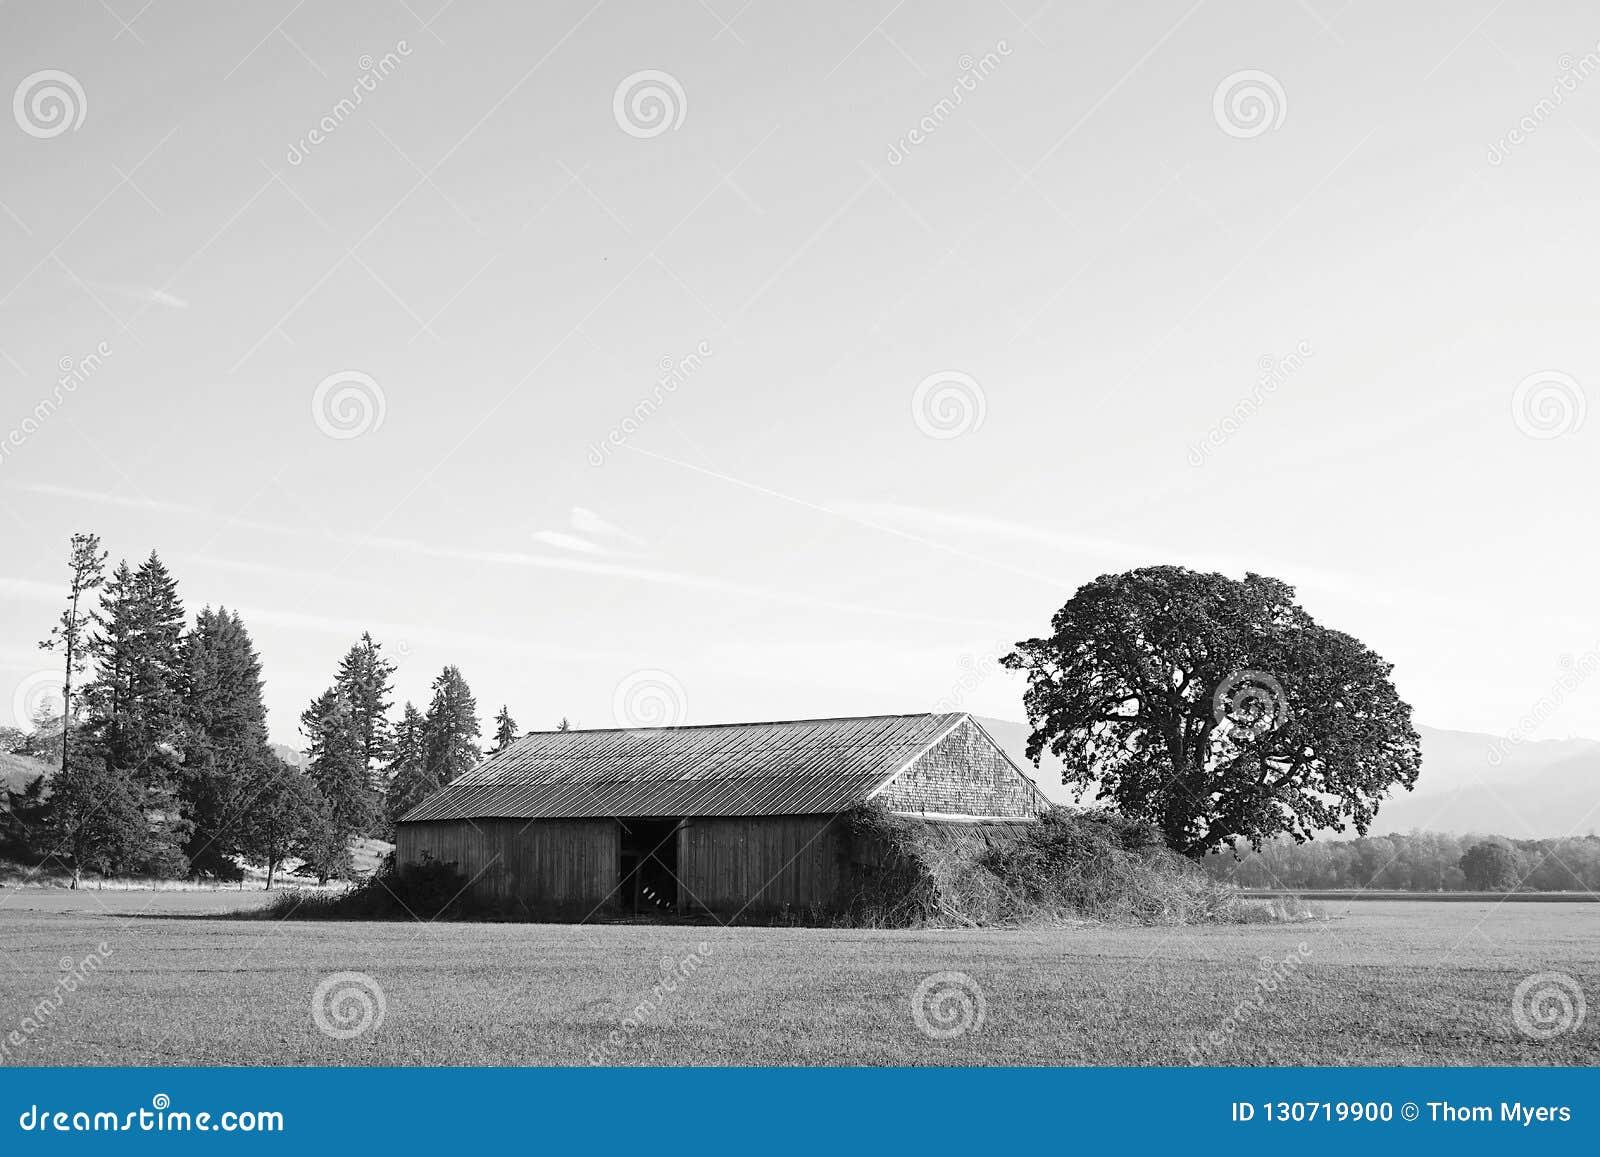 Oregon barn building stock photo. Image of barn ...